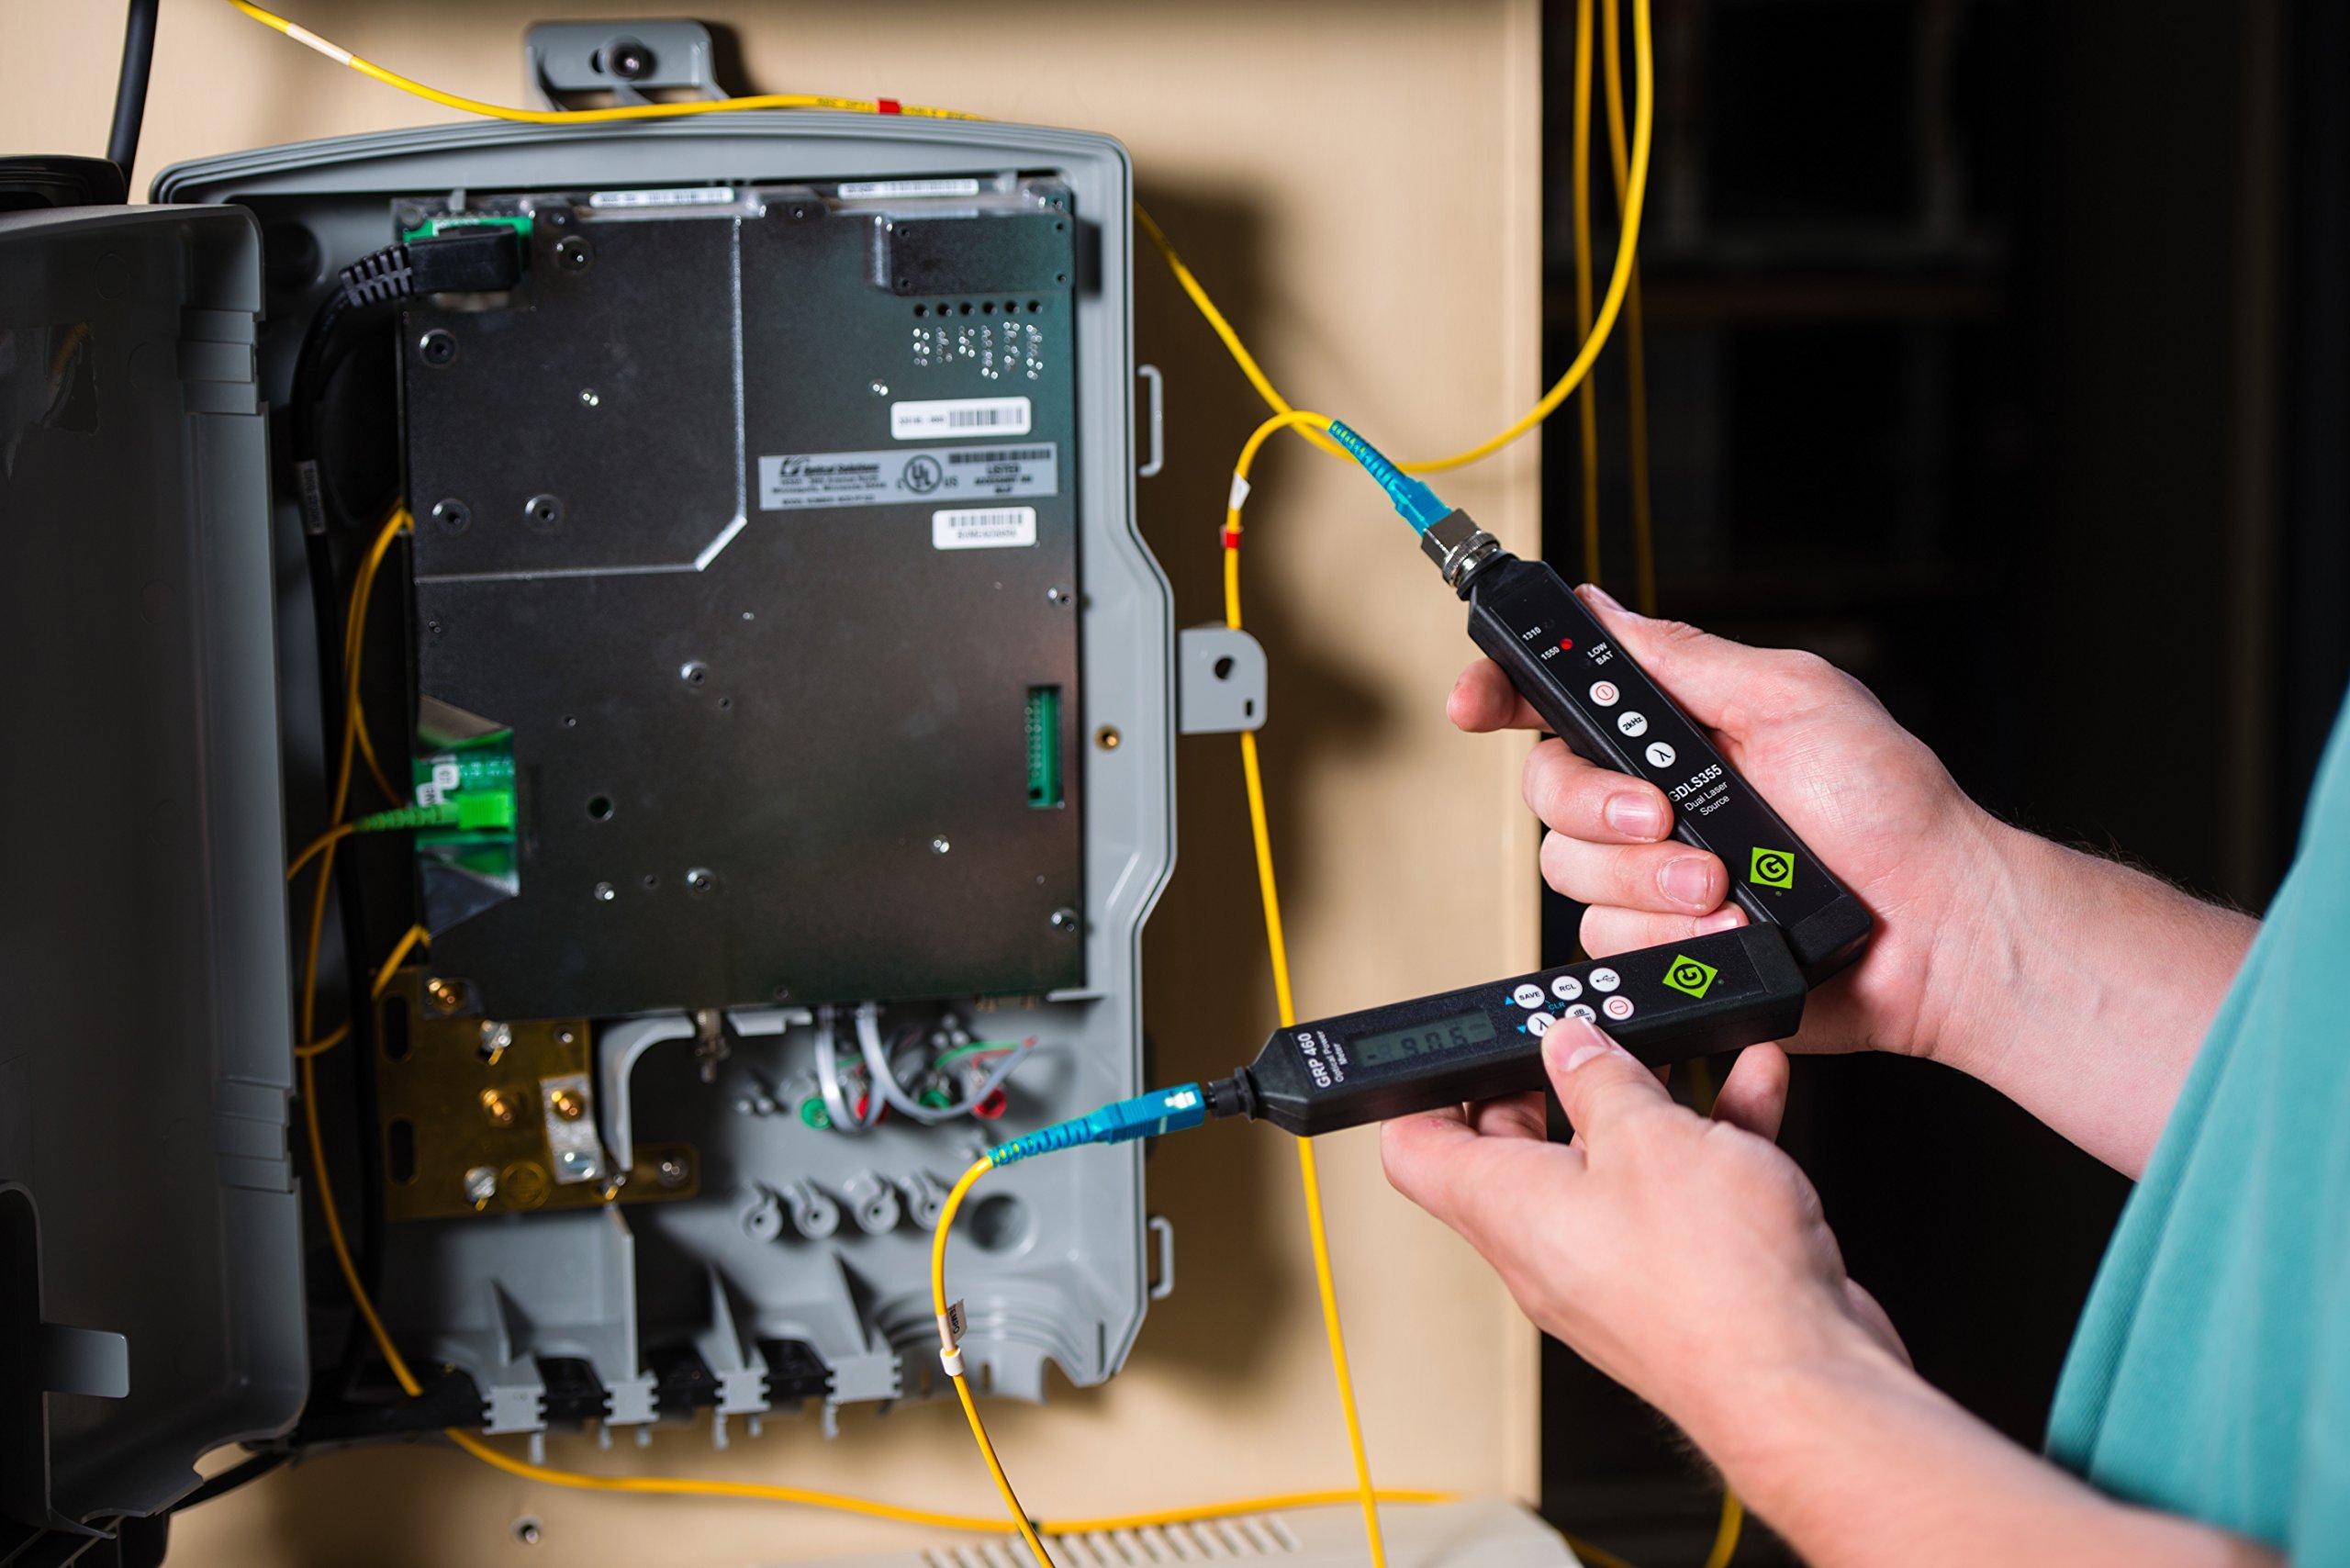 Greenlee GRP 460-04 Fiber Tools Optical Power Meter with InGaAs Filtered Detector by Greenlee (Image #4)